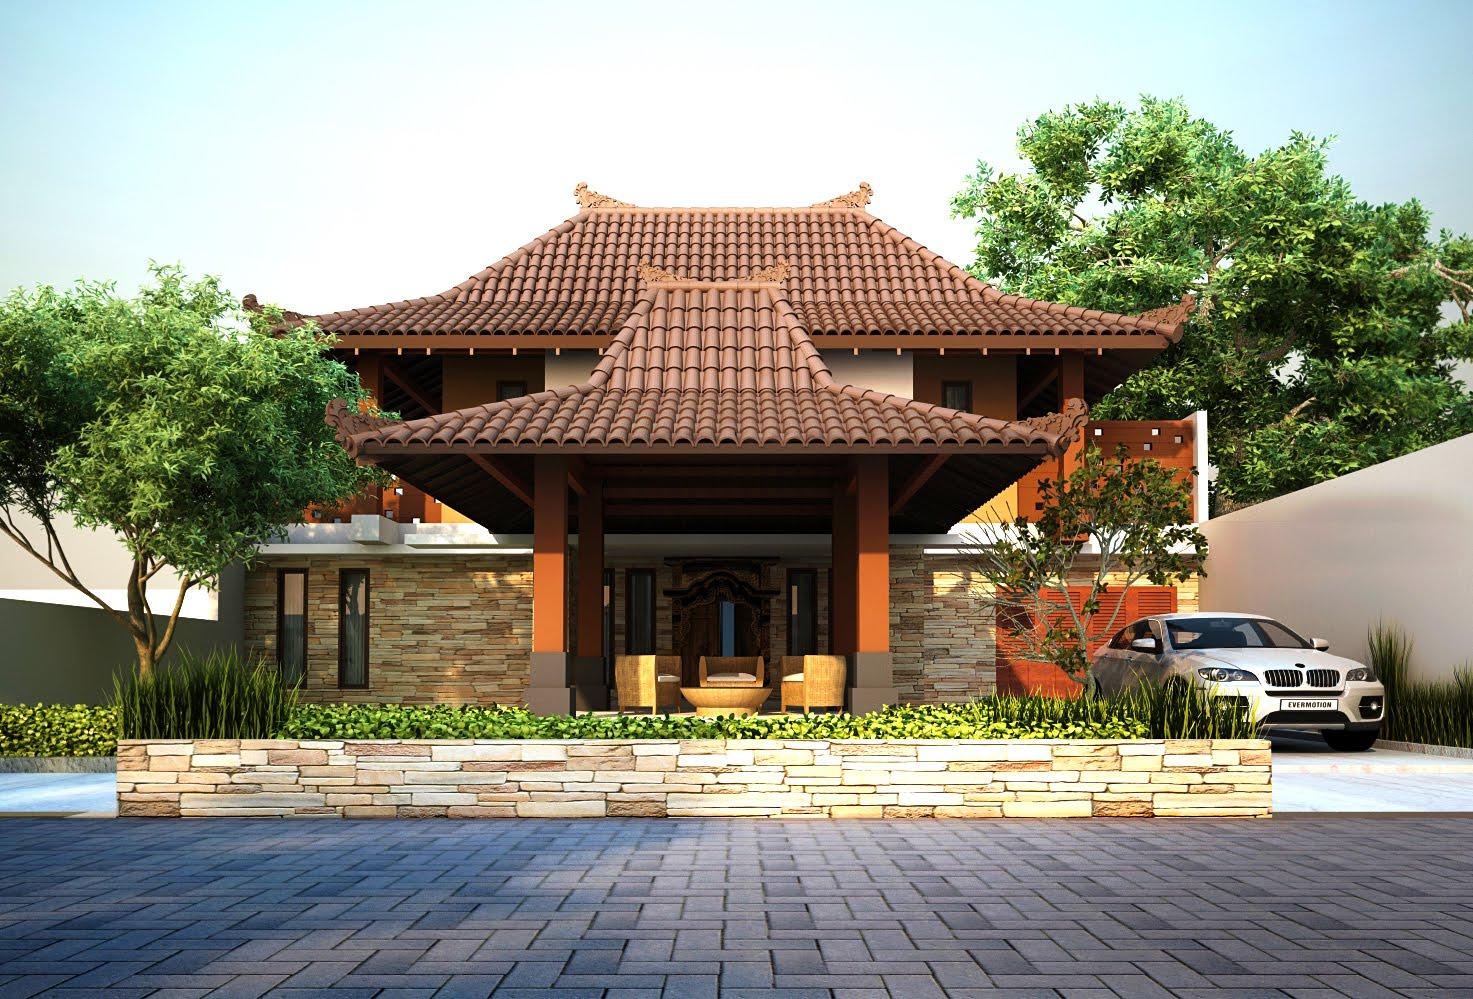 550+ Contoh Gambar Rumah Joglo Minimalis Gratis